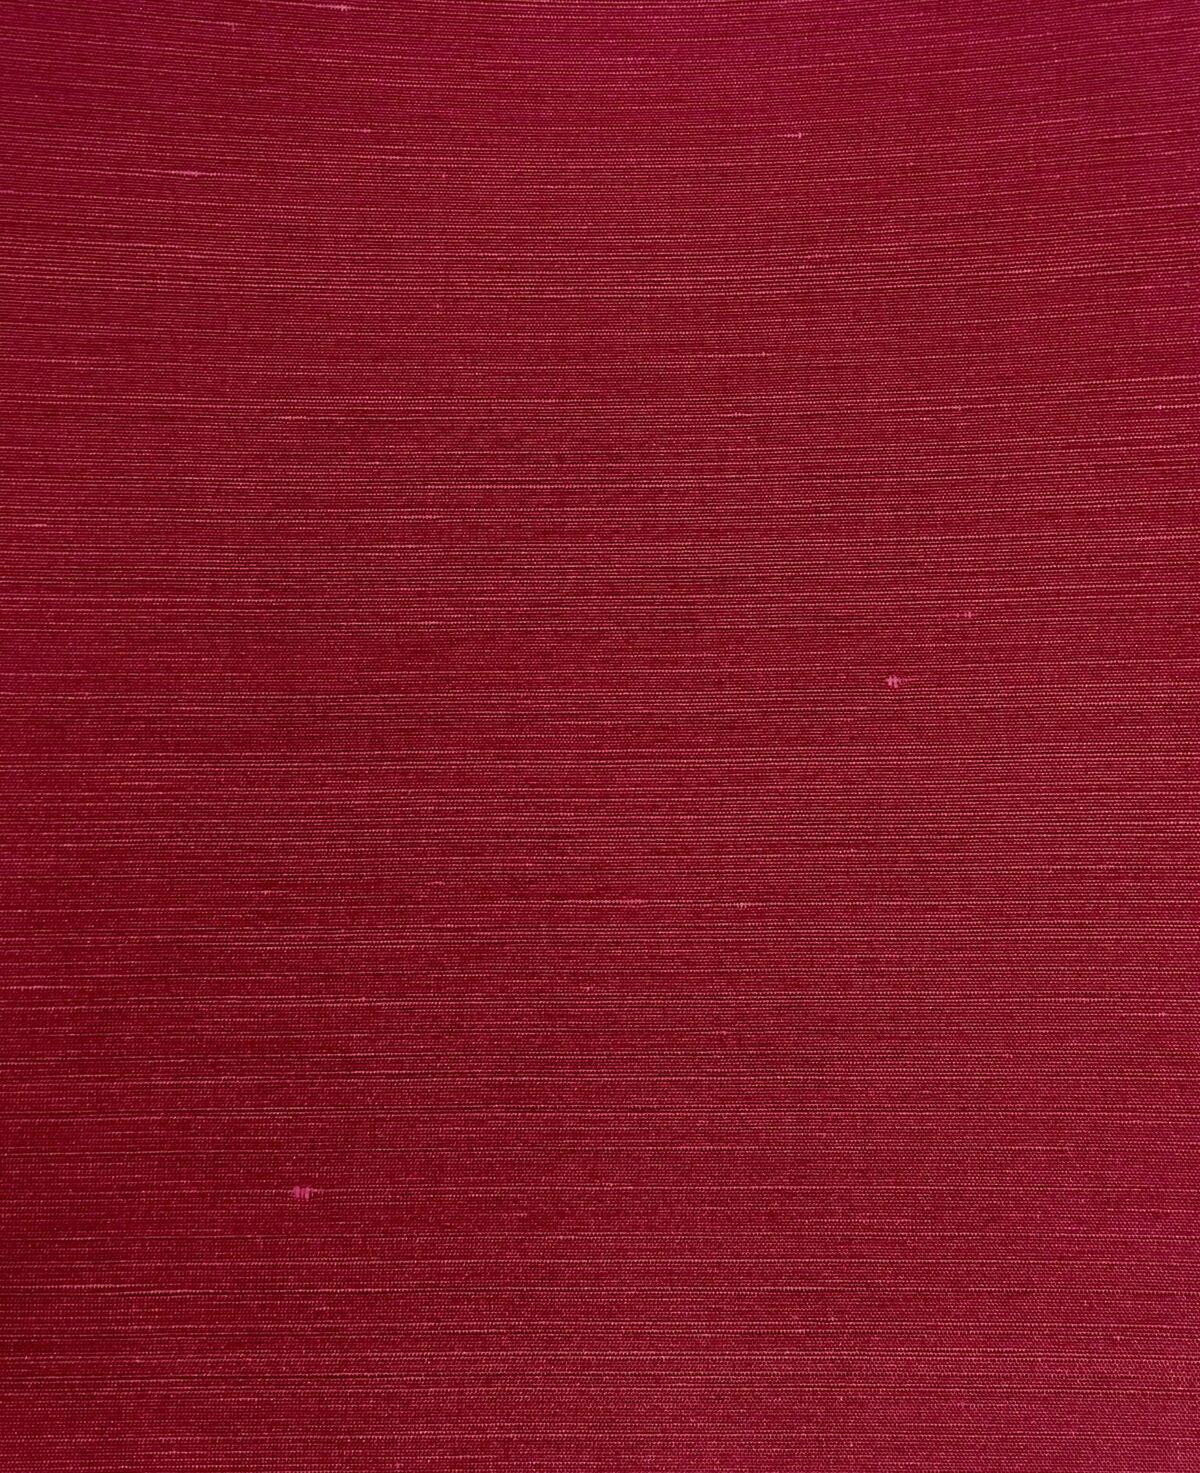 Savoy Silk Wallpaper 032 PLAIN FABRICS RED